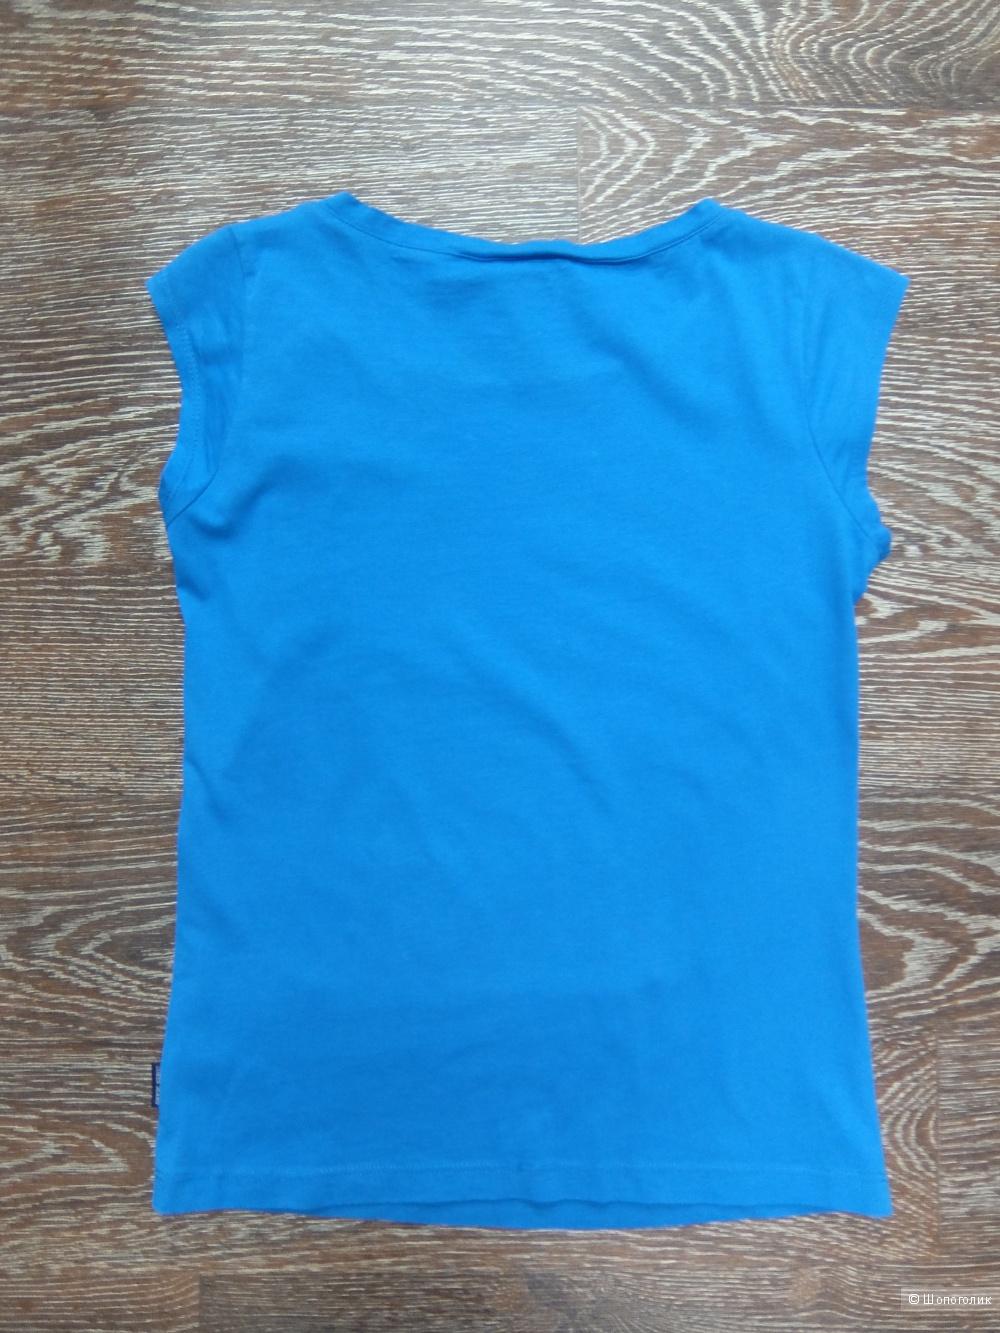 Футболка Guess синяя с лентой (р. RUS 42-44). Новая.